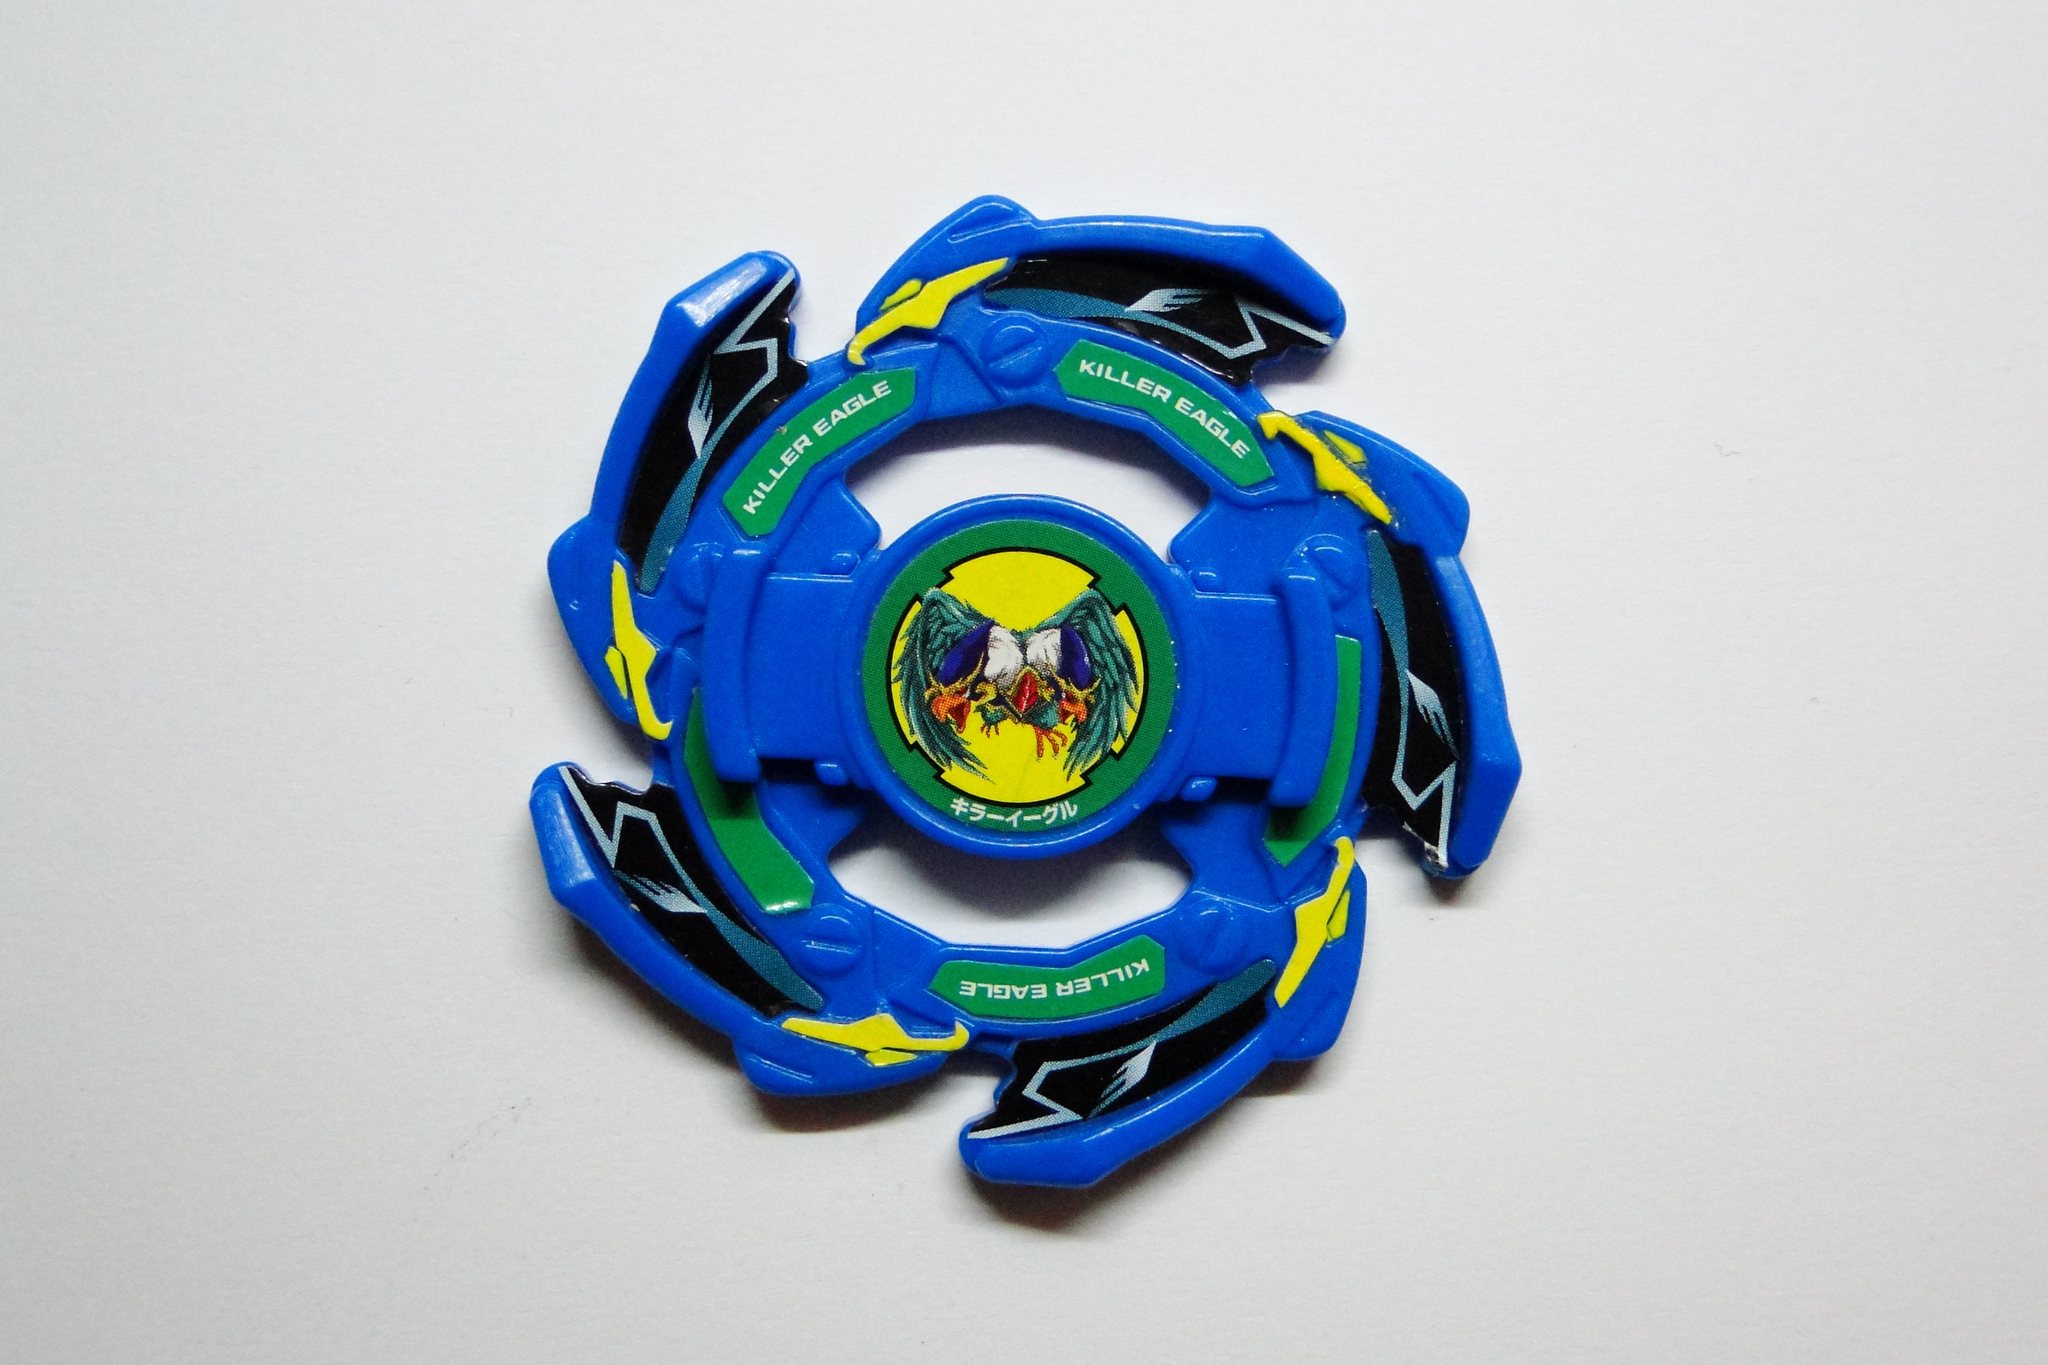 Attack Ring - Penta Wing